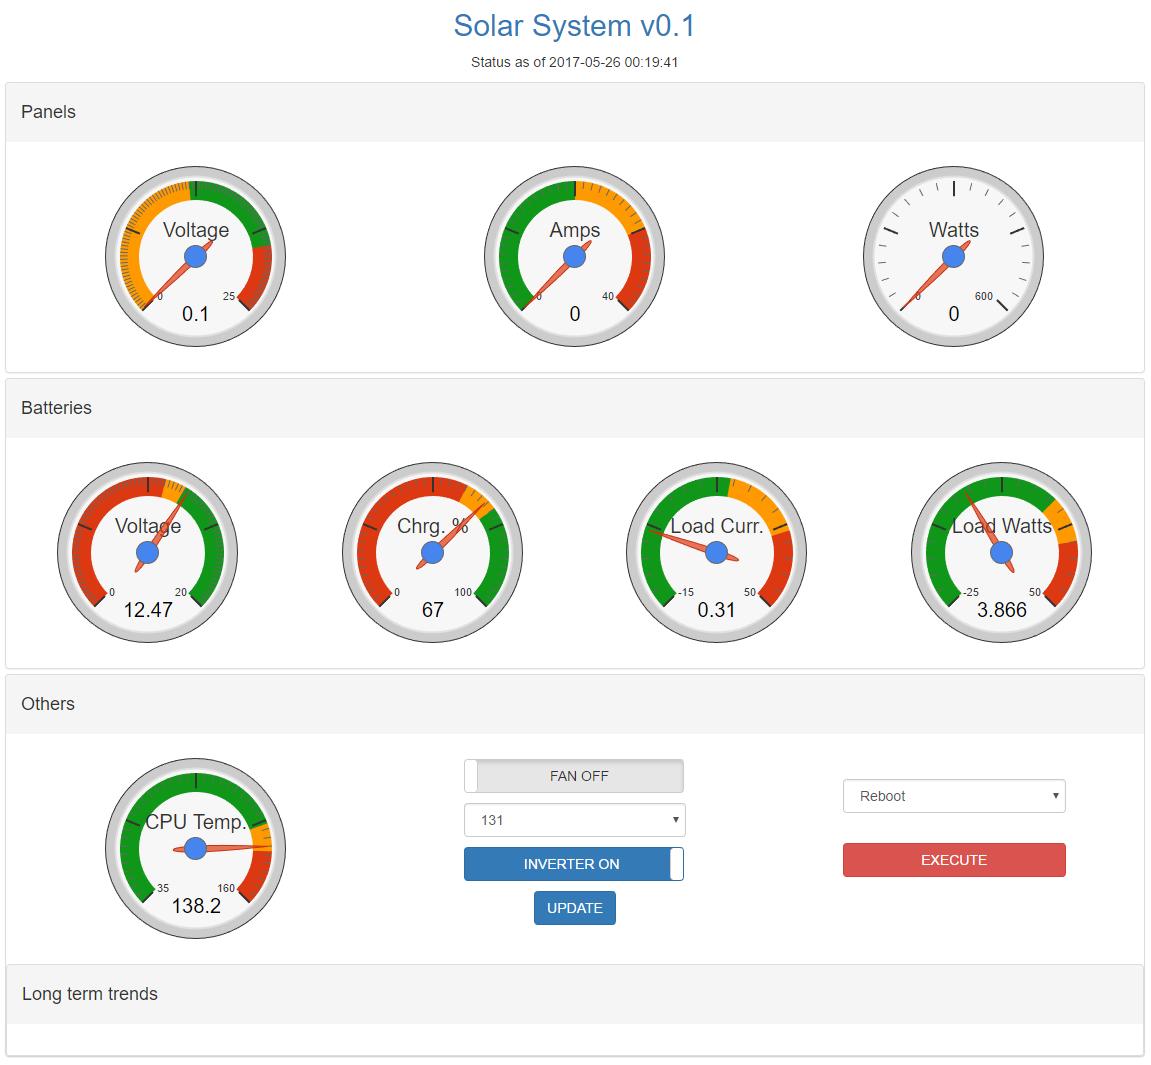 Desktop view of the solar system web interface gauges.